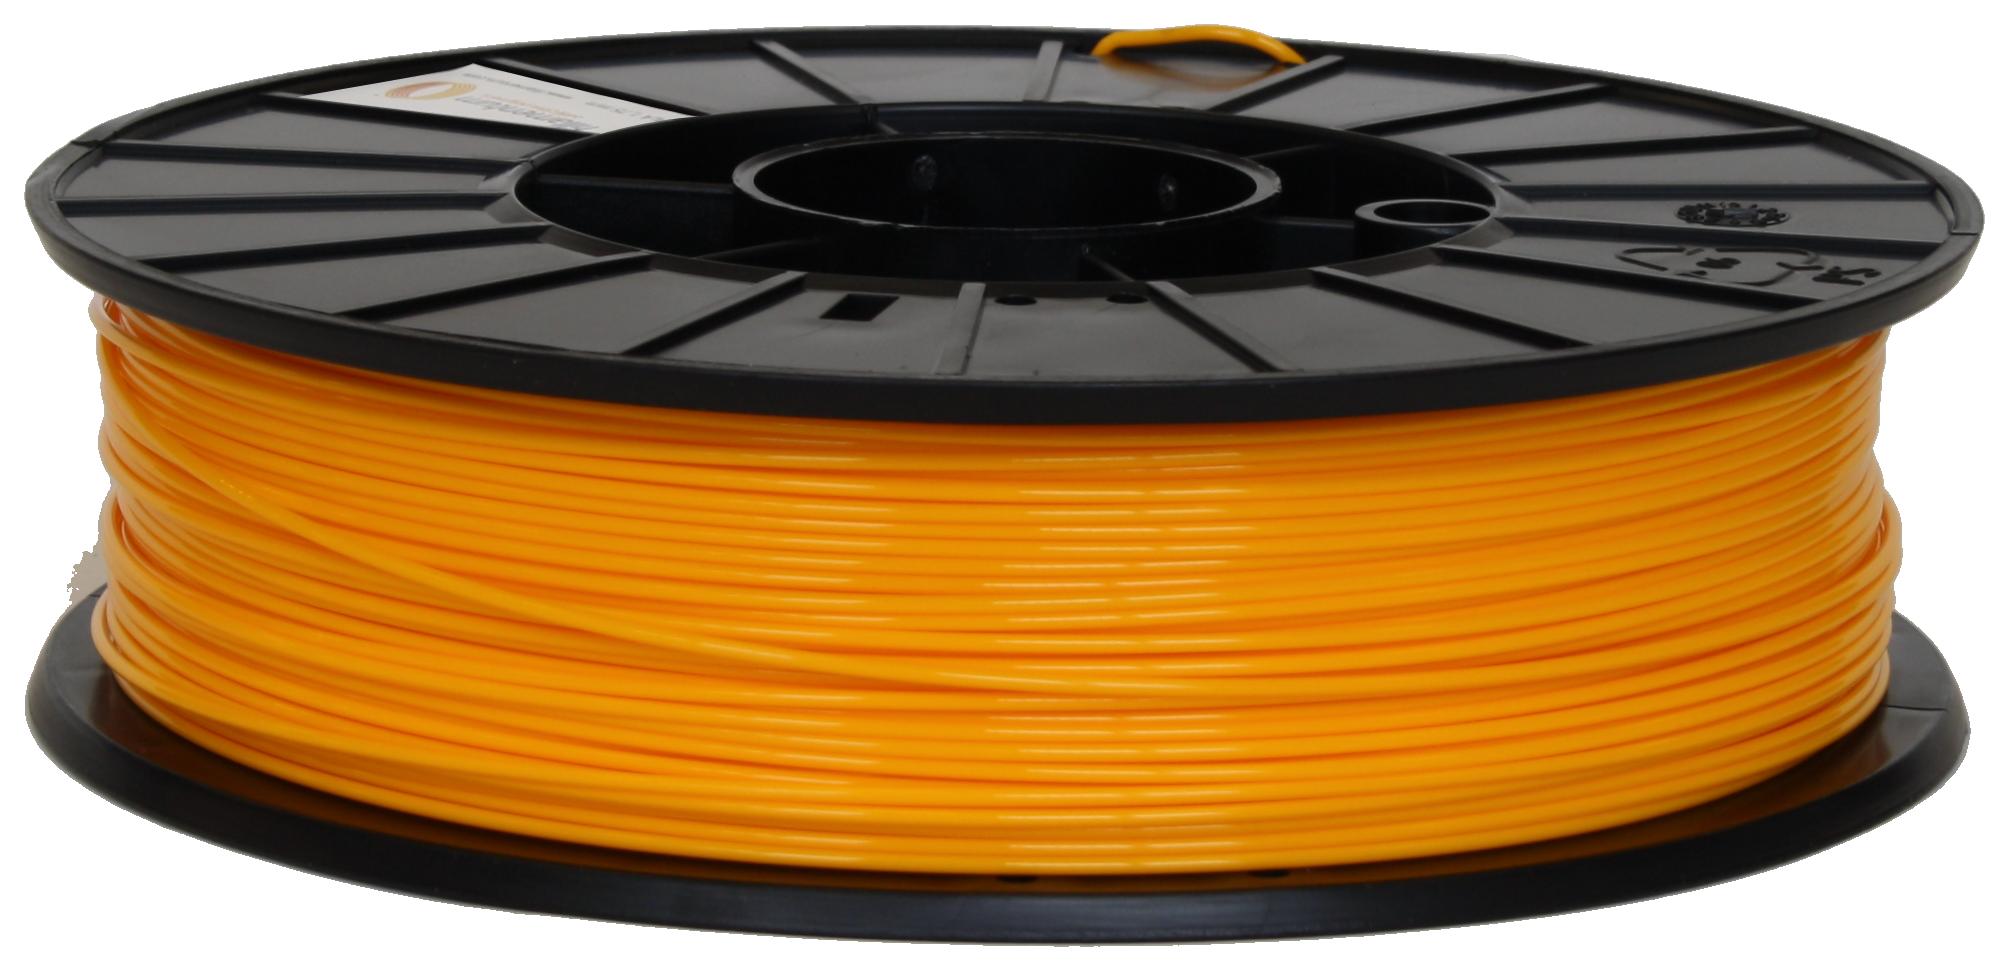 Fillamentum PLA Extrafill 1.75 mm Melon Yellow